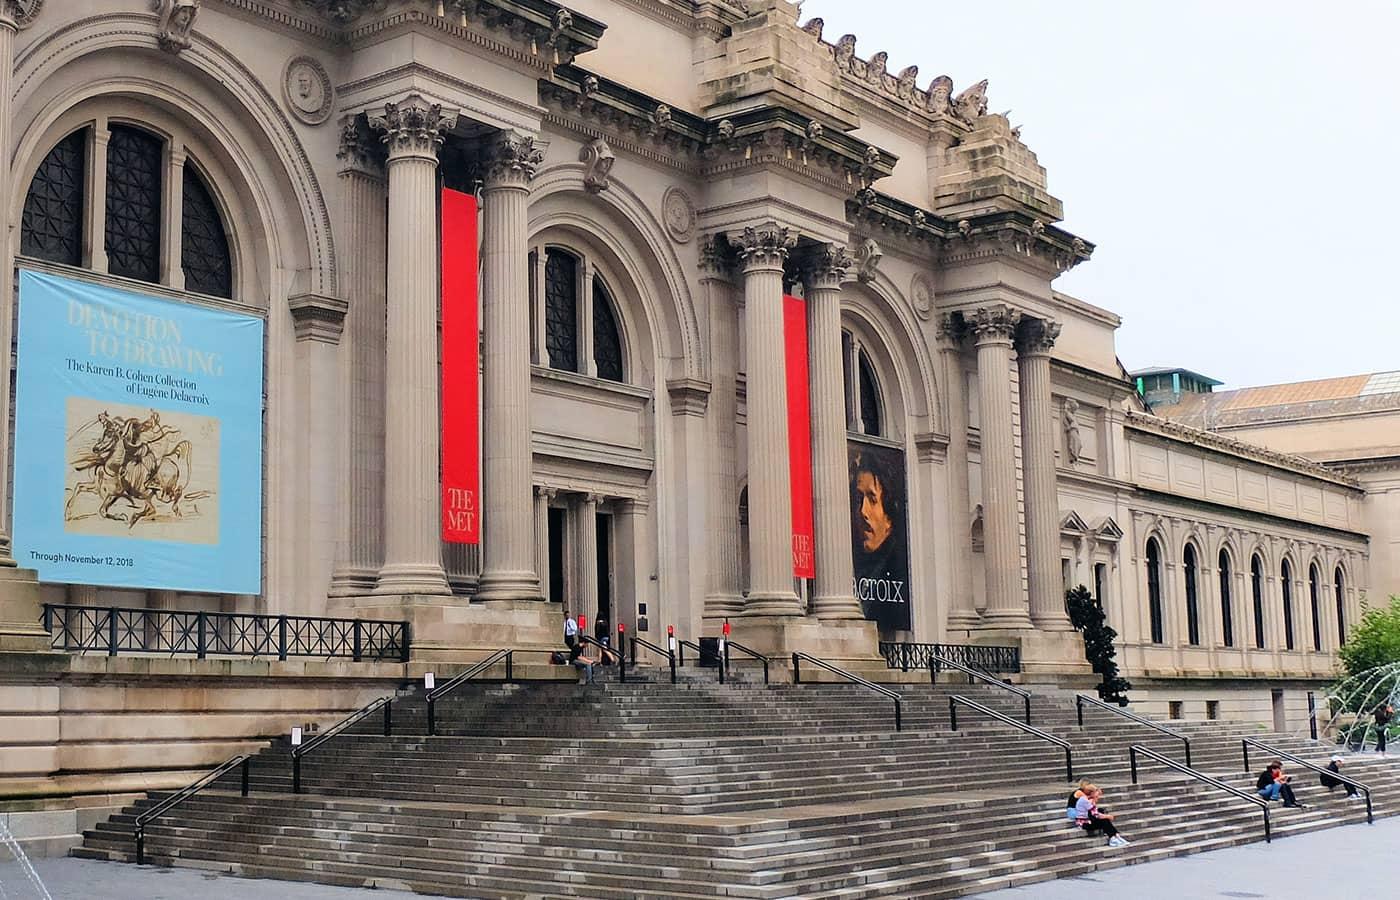 Gossip Girl Tour New York - The Met Steps